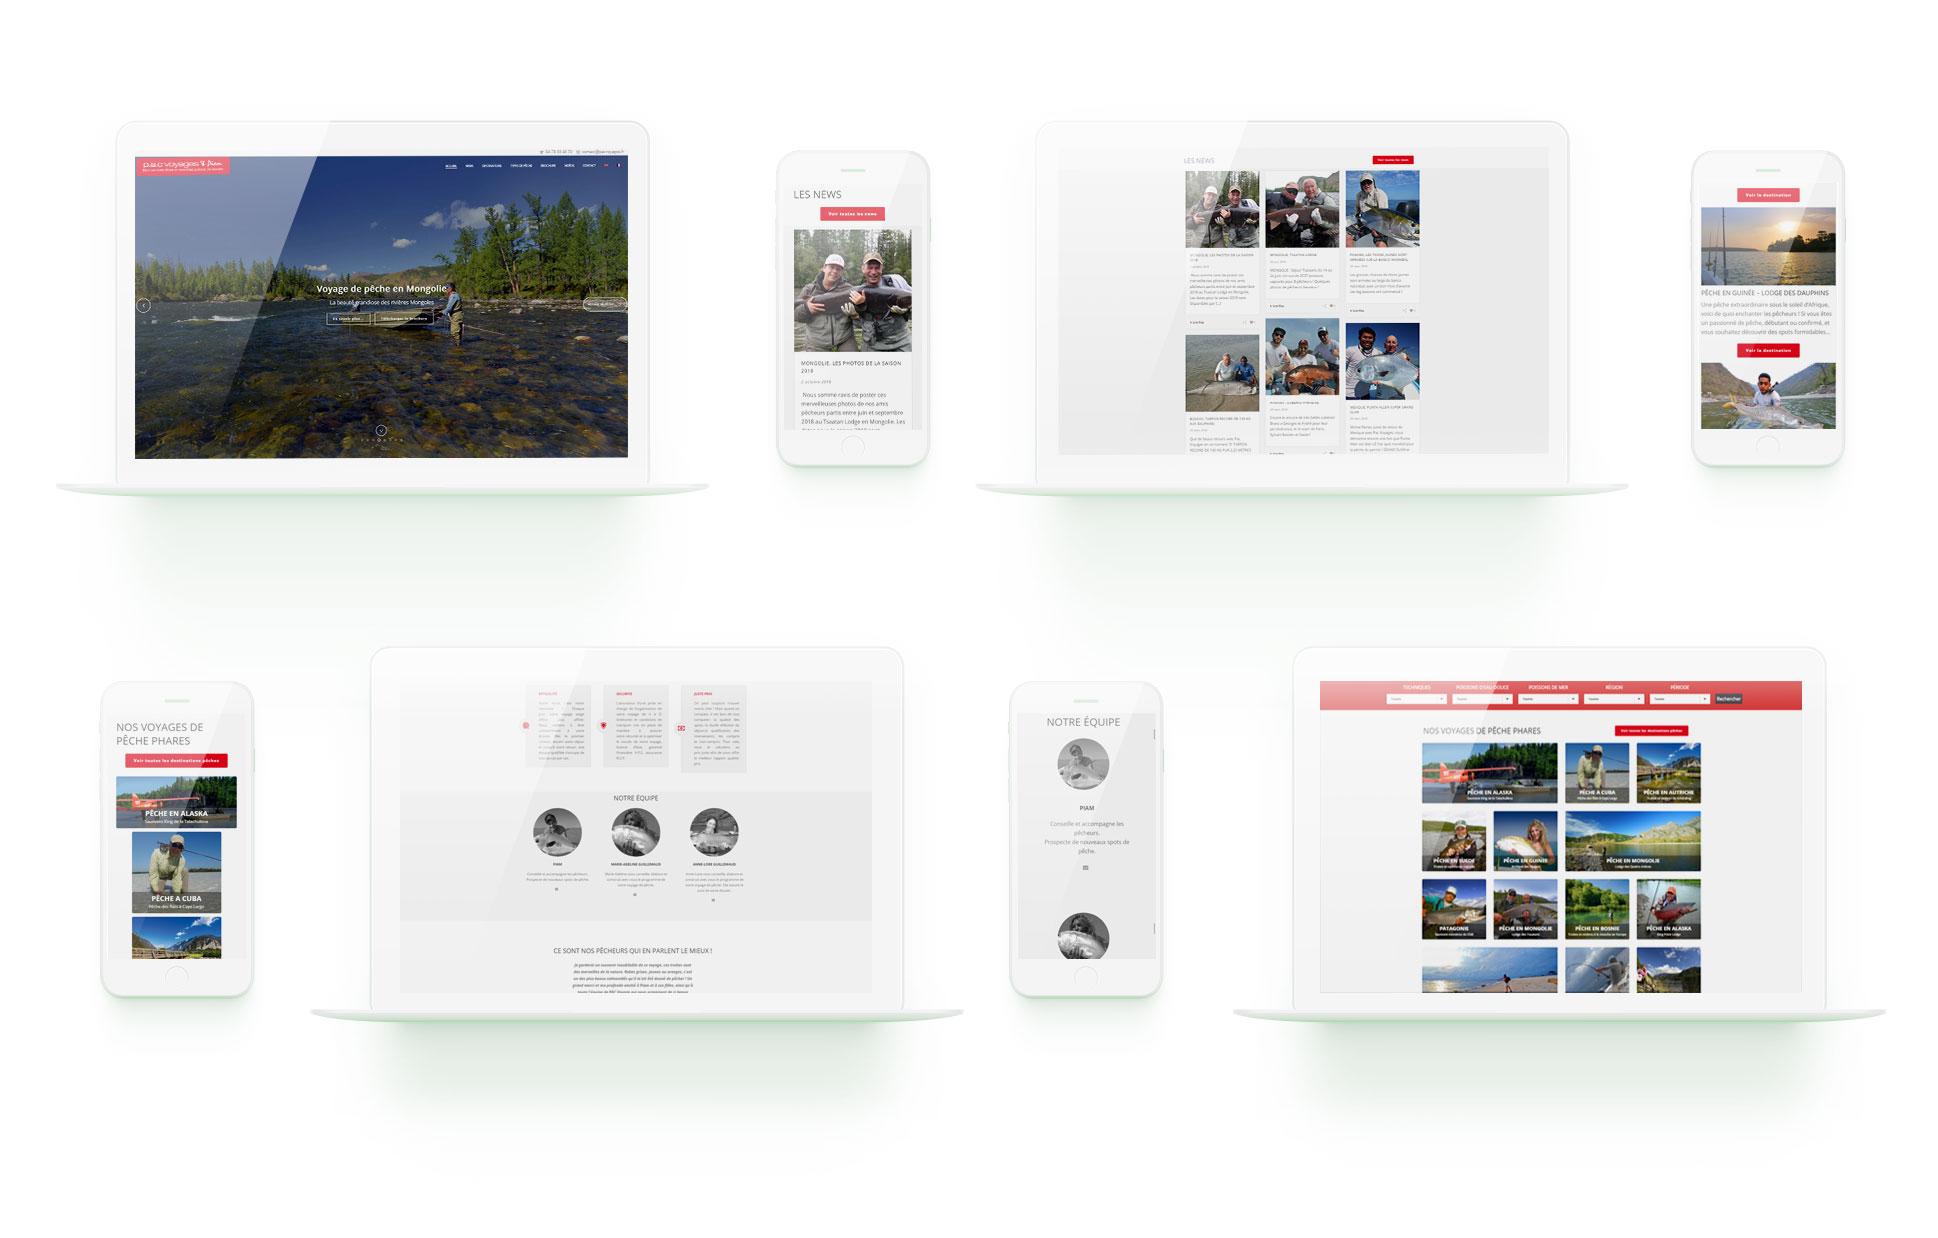 macbook iphone mockup PAC voyages agence web design site wordpress lyon boutique ecommerce commerce en ligne graphisme illustration logo arkanite